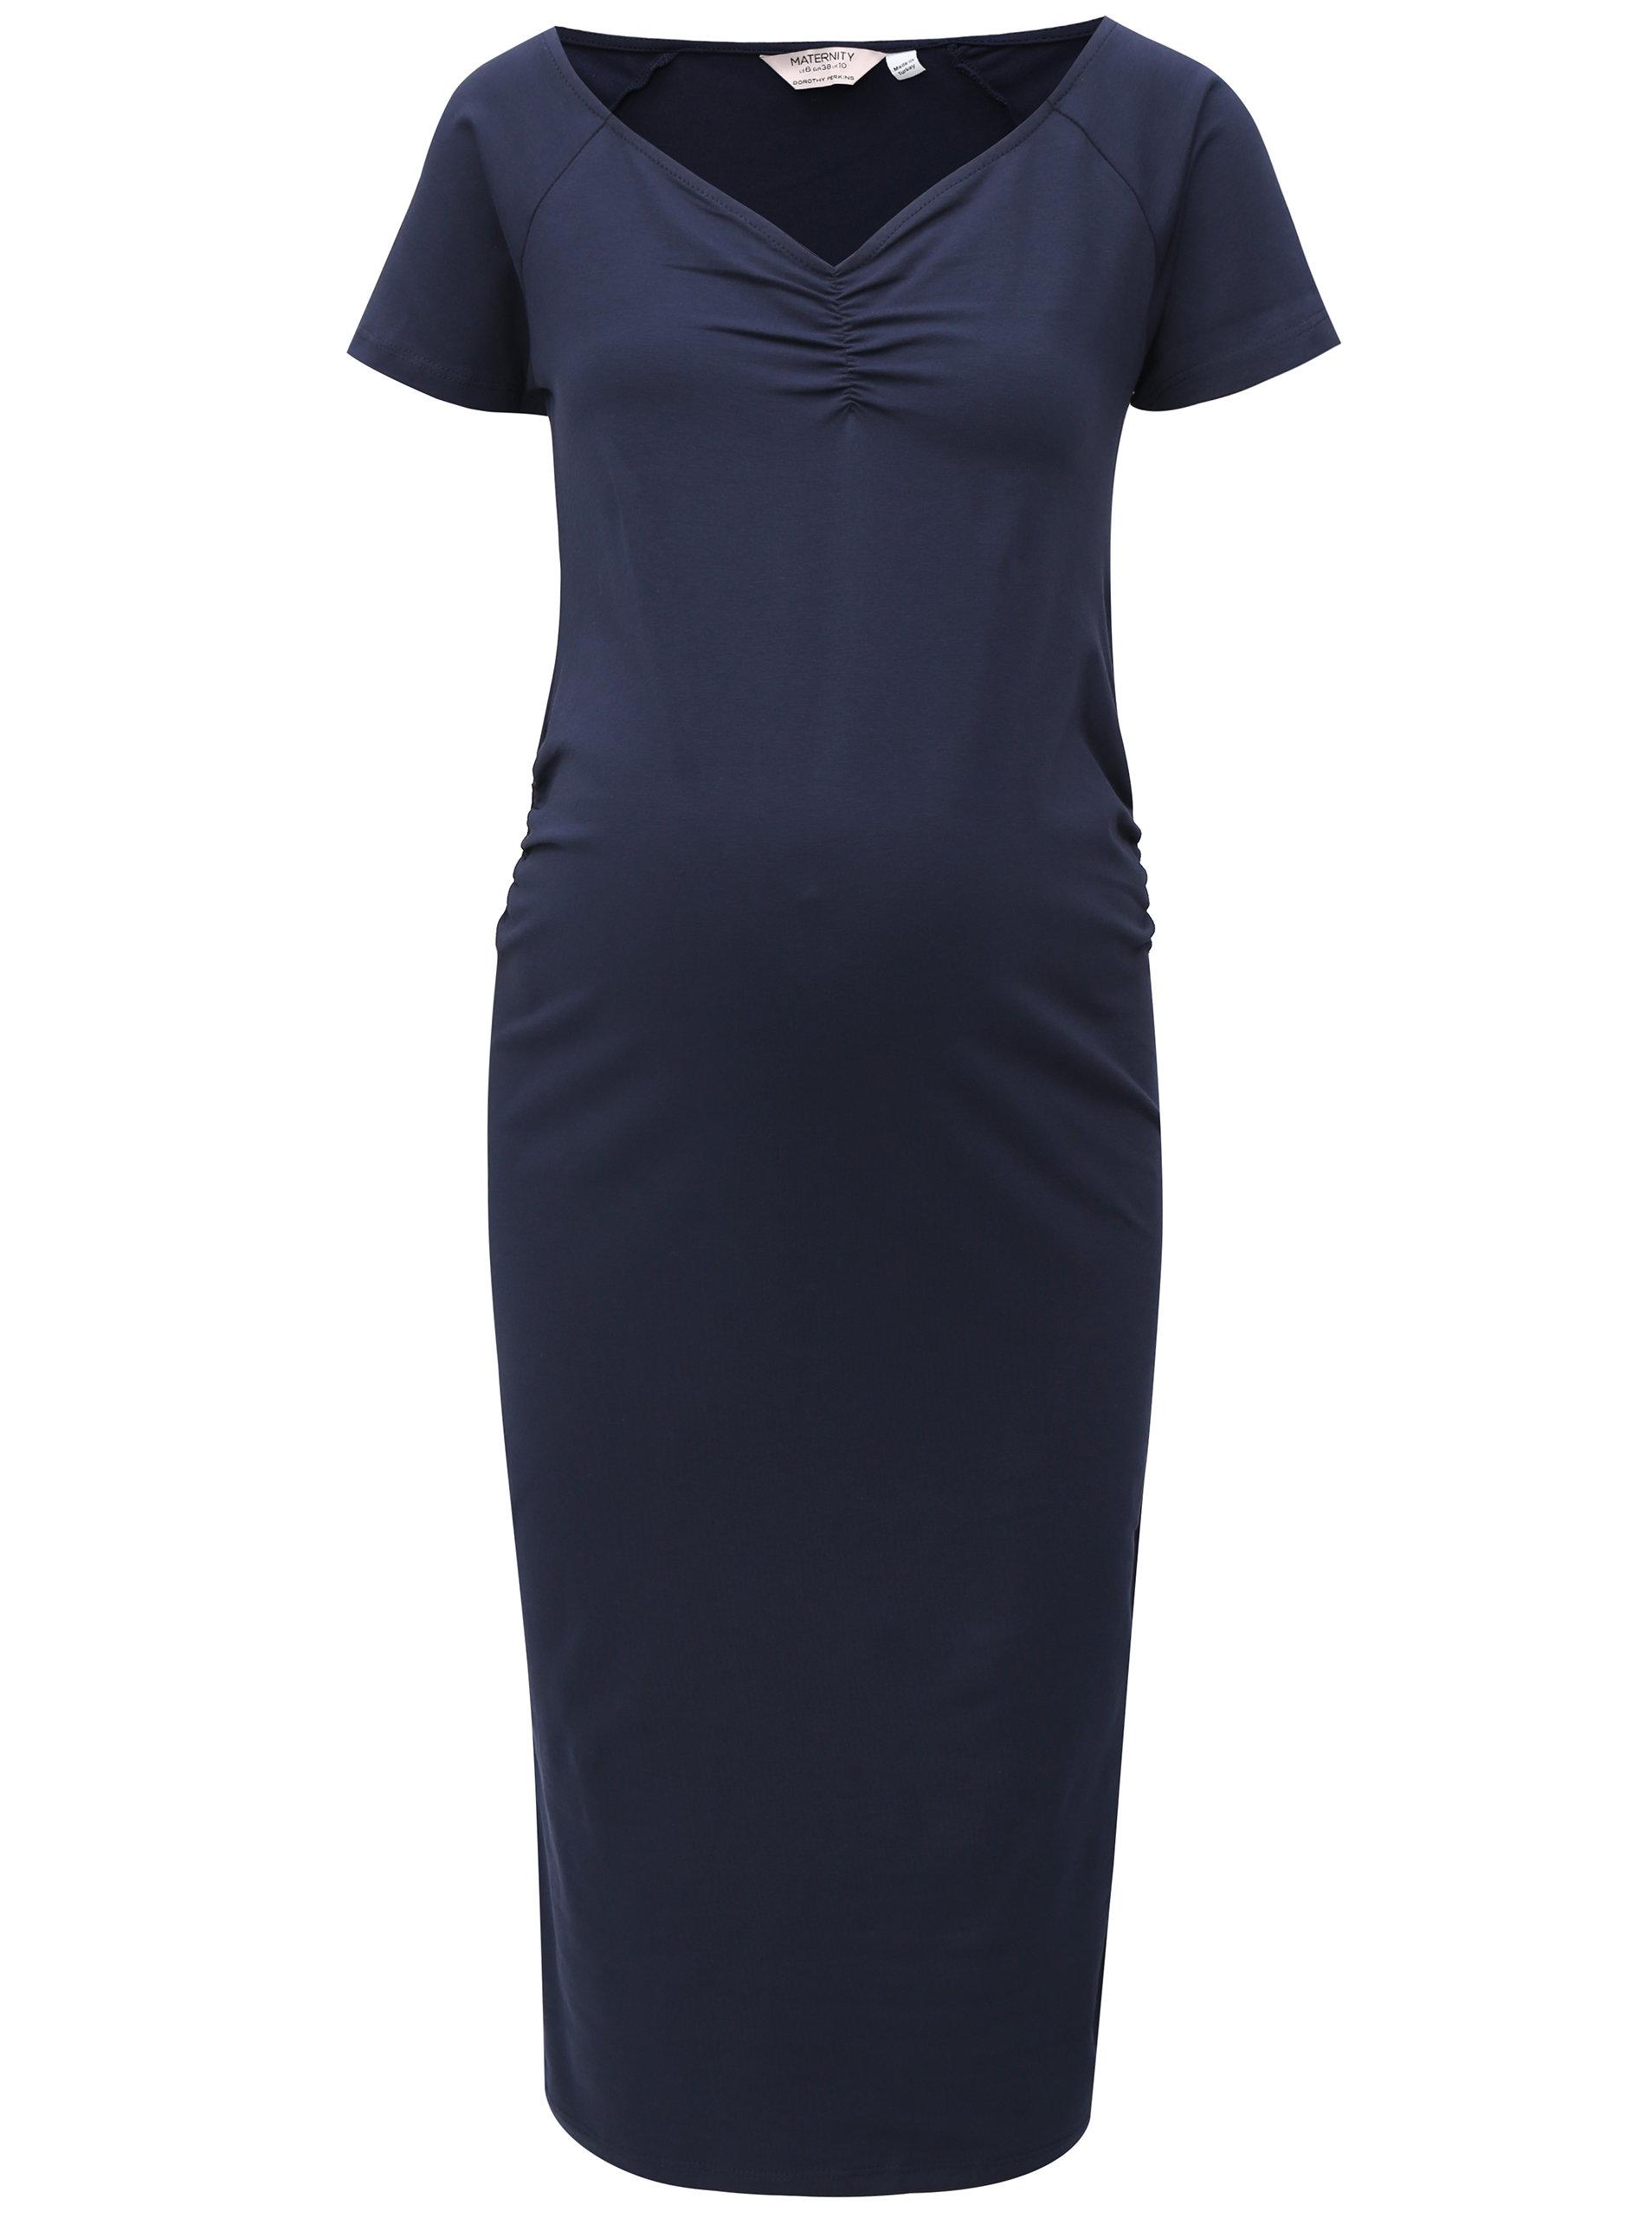 a379f59e5475 Tmavomodré puzdrové tehotenské šaty Dorothy Perkins Maternity ...